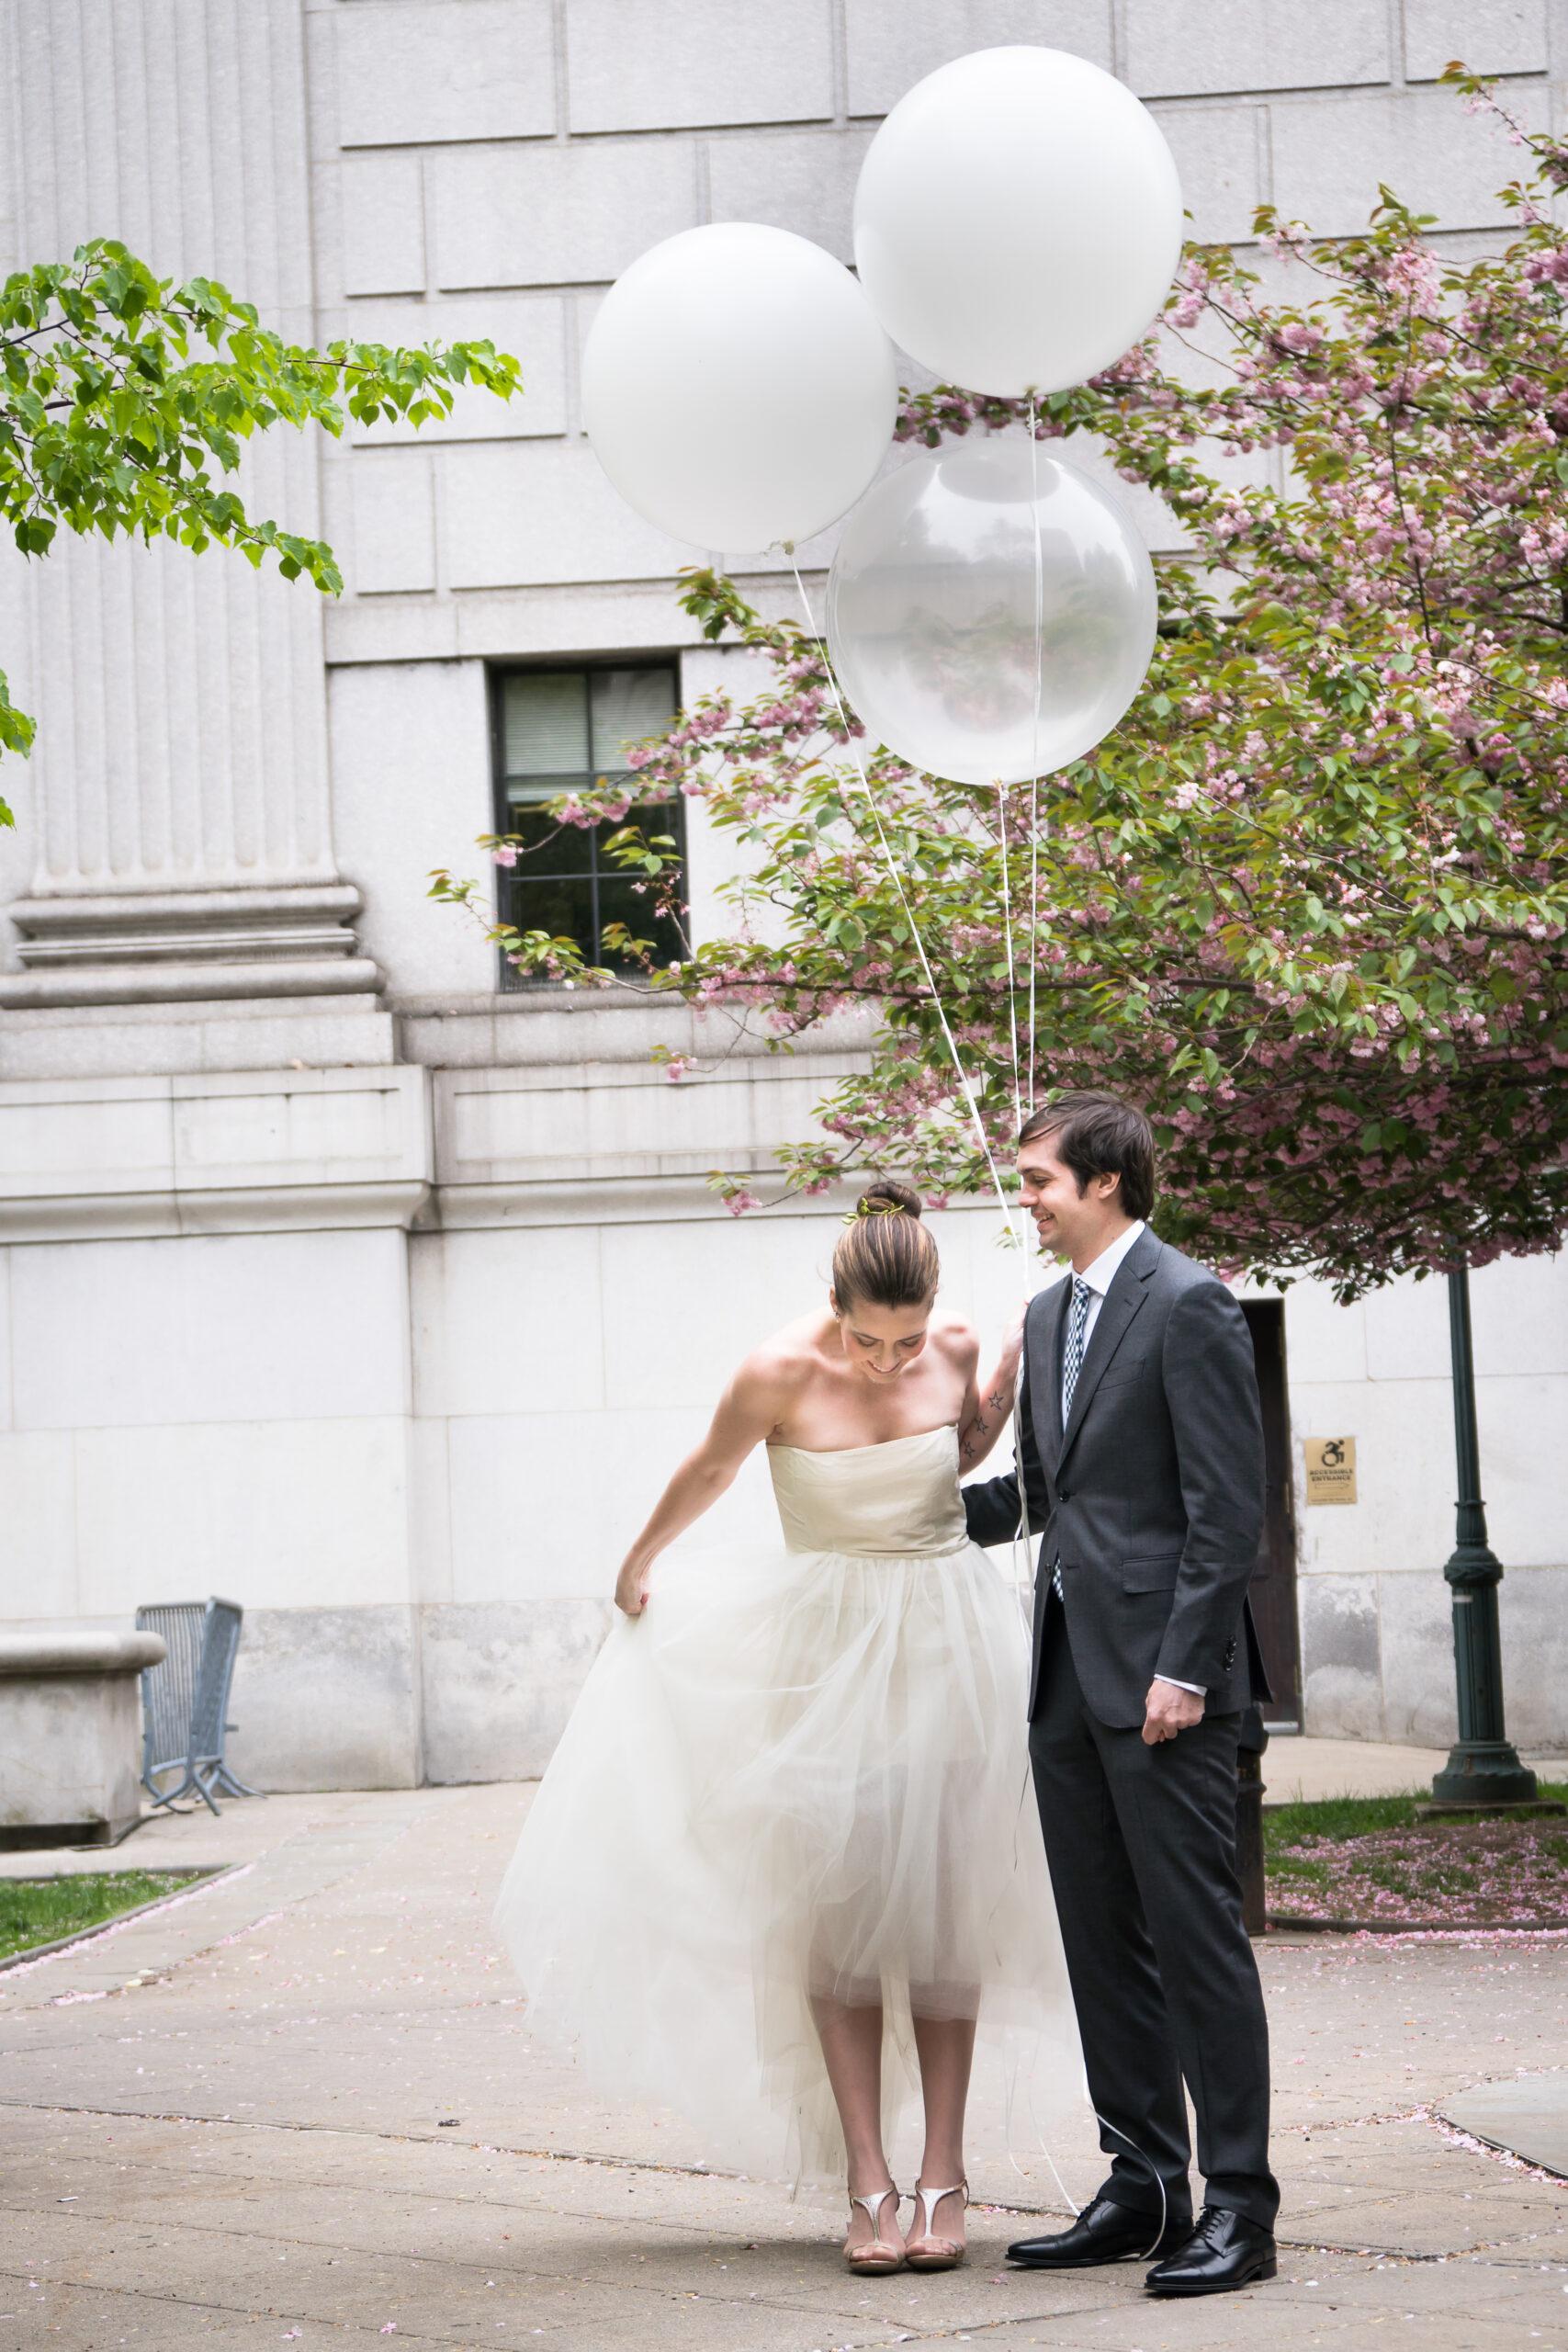 My Beautiful, Intimate Wedding